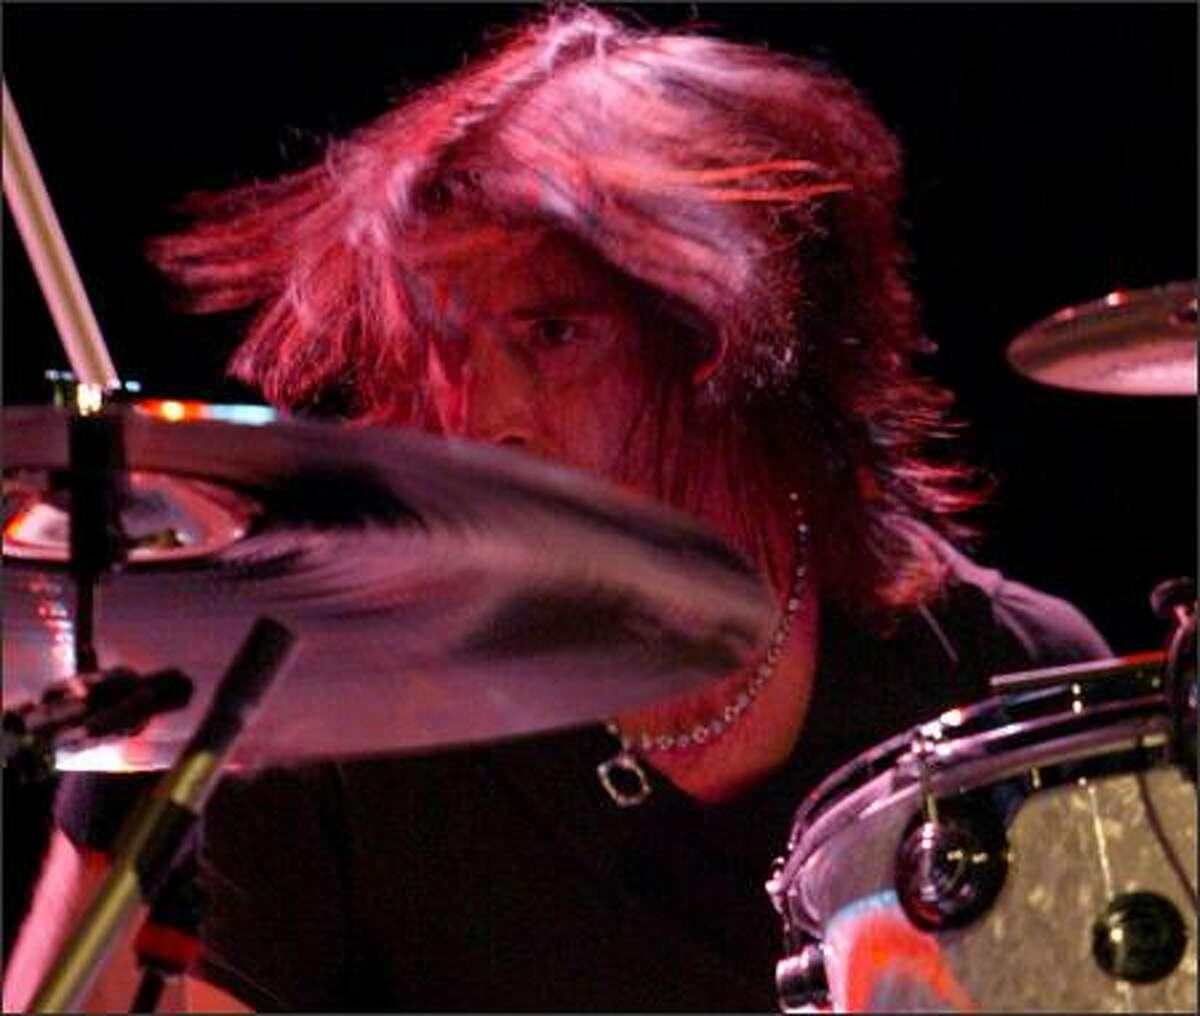 Drummer Sean Kinney at work.